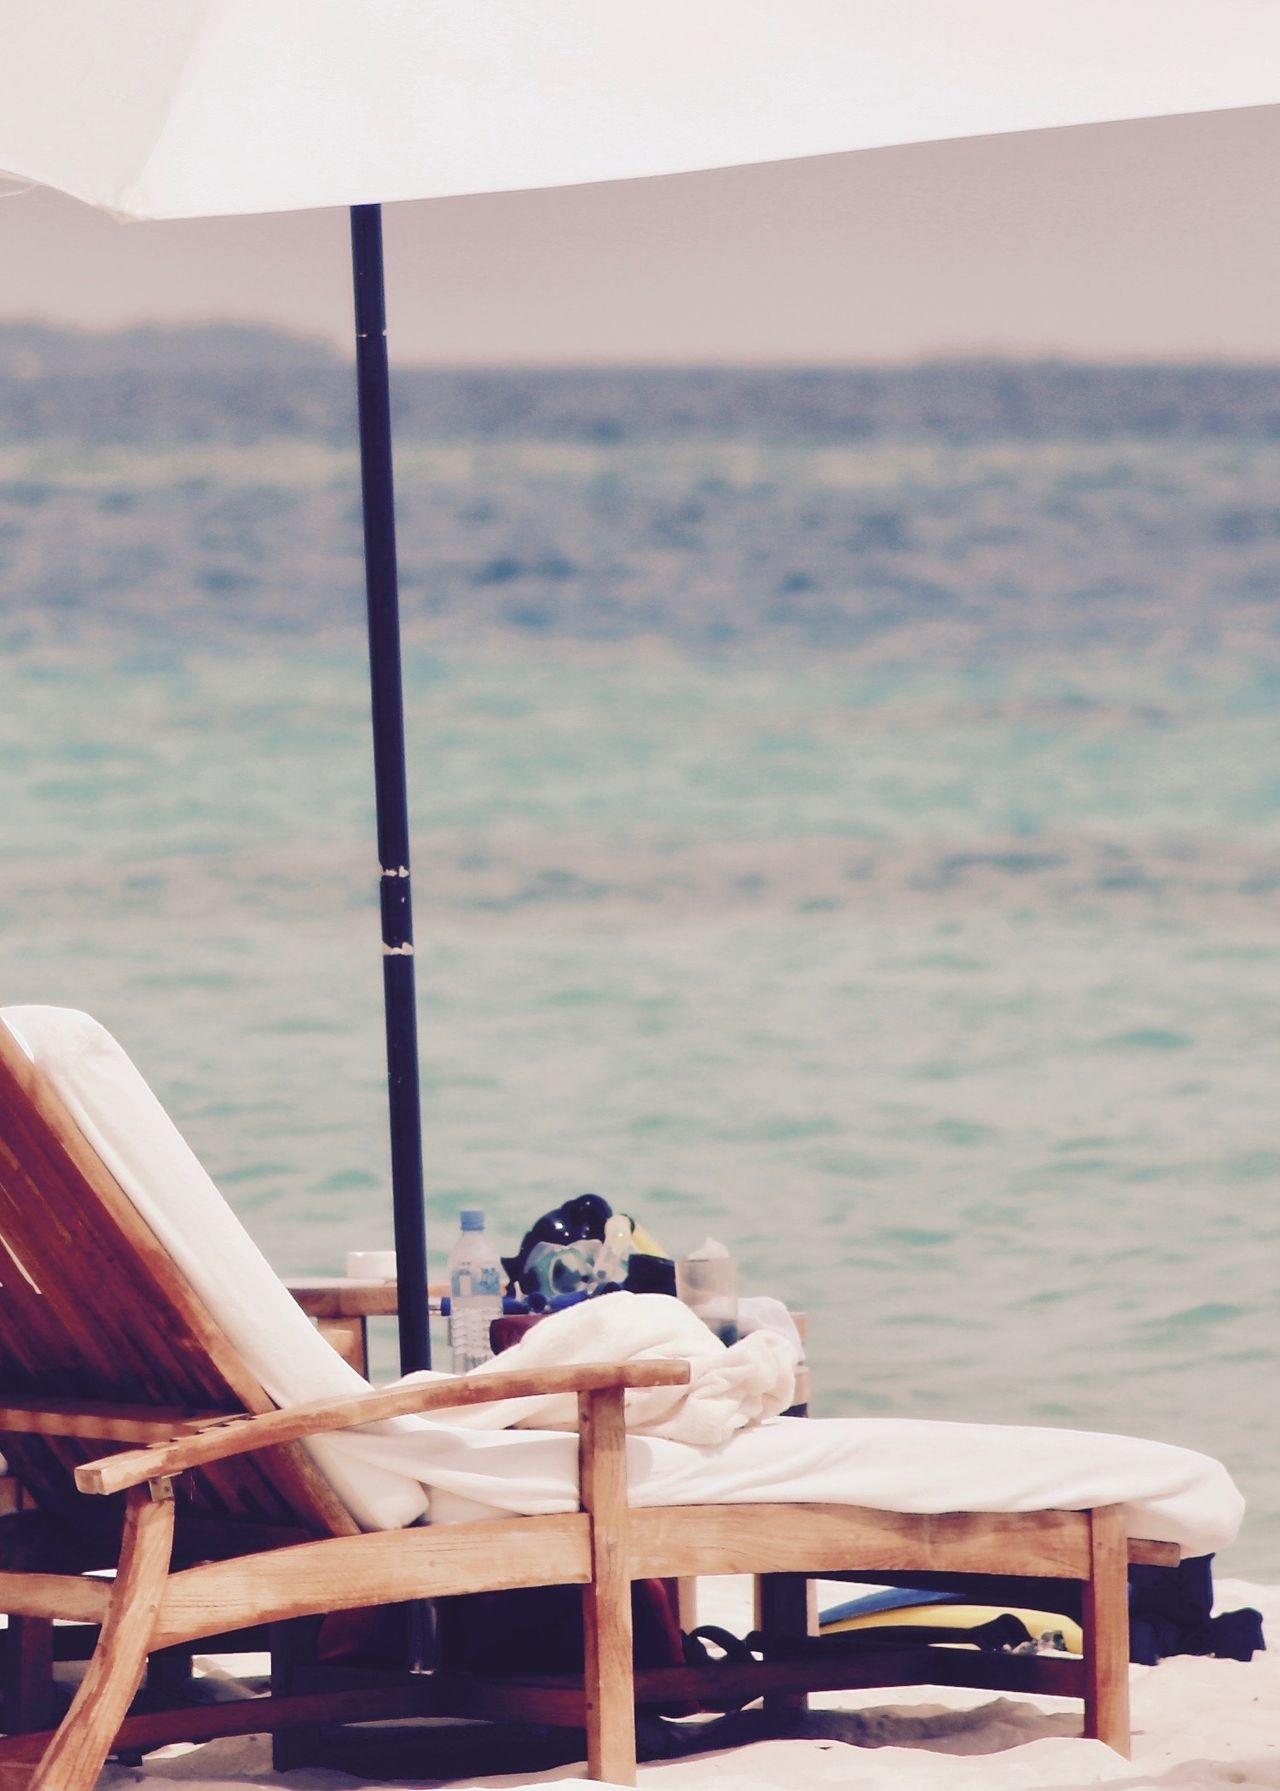 Beach Life Lifestyles Sea Outdoors Nature Travel Sunshine Summer Deck Chair Life Is A Beach Beach Beach Life Colors Light Relaxing Sunbed Scenics Tropical Sand Holiday Nature Design Deckchairs Fun Parasol Horizon Over Water